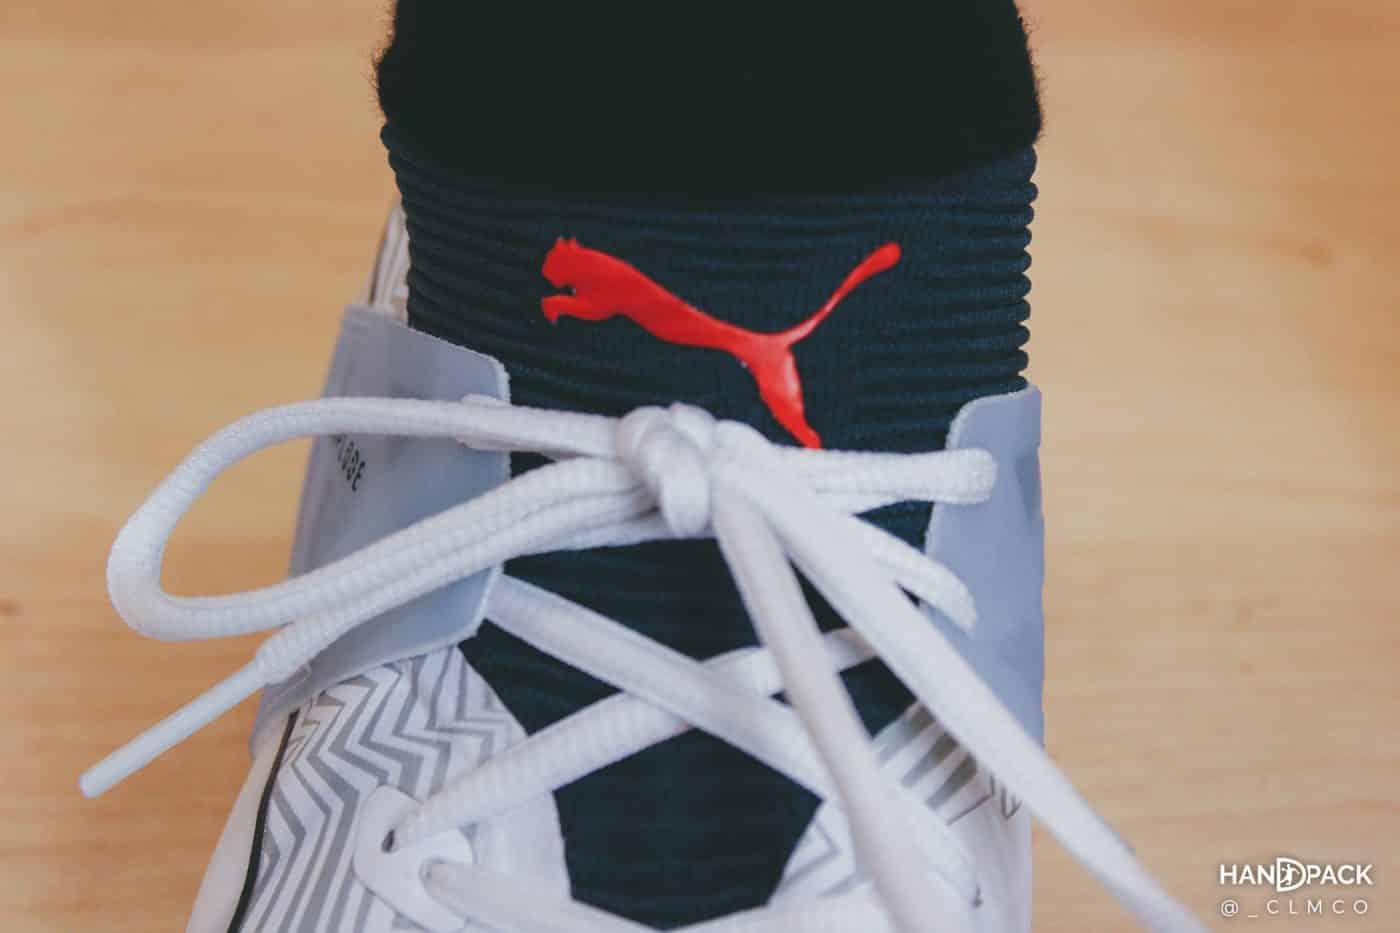 puma-explode-eh1-test-chaussures-de-hand-handpack-10